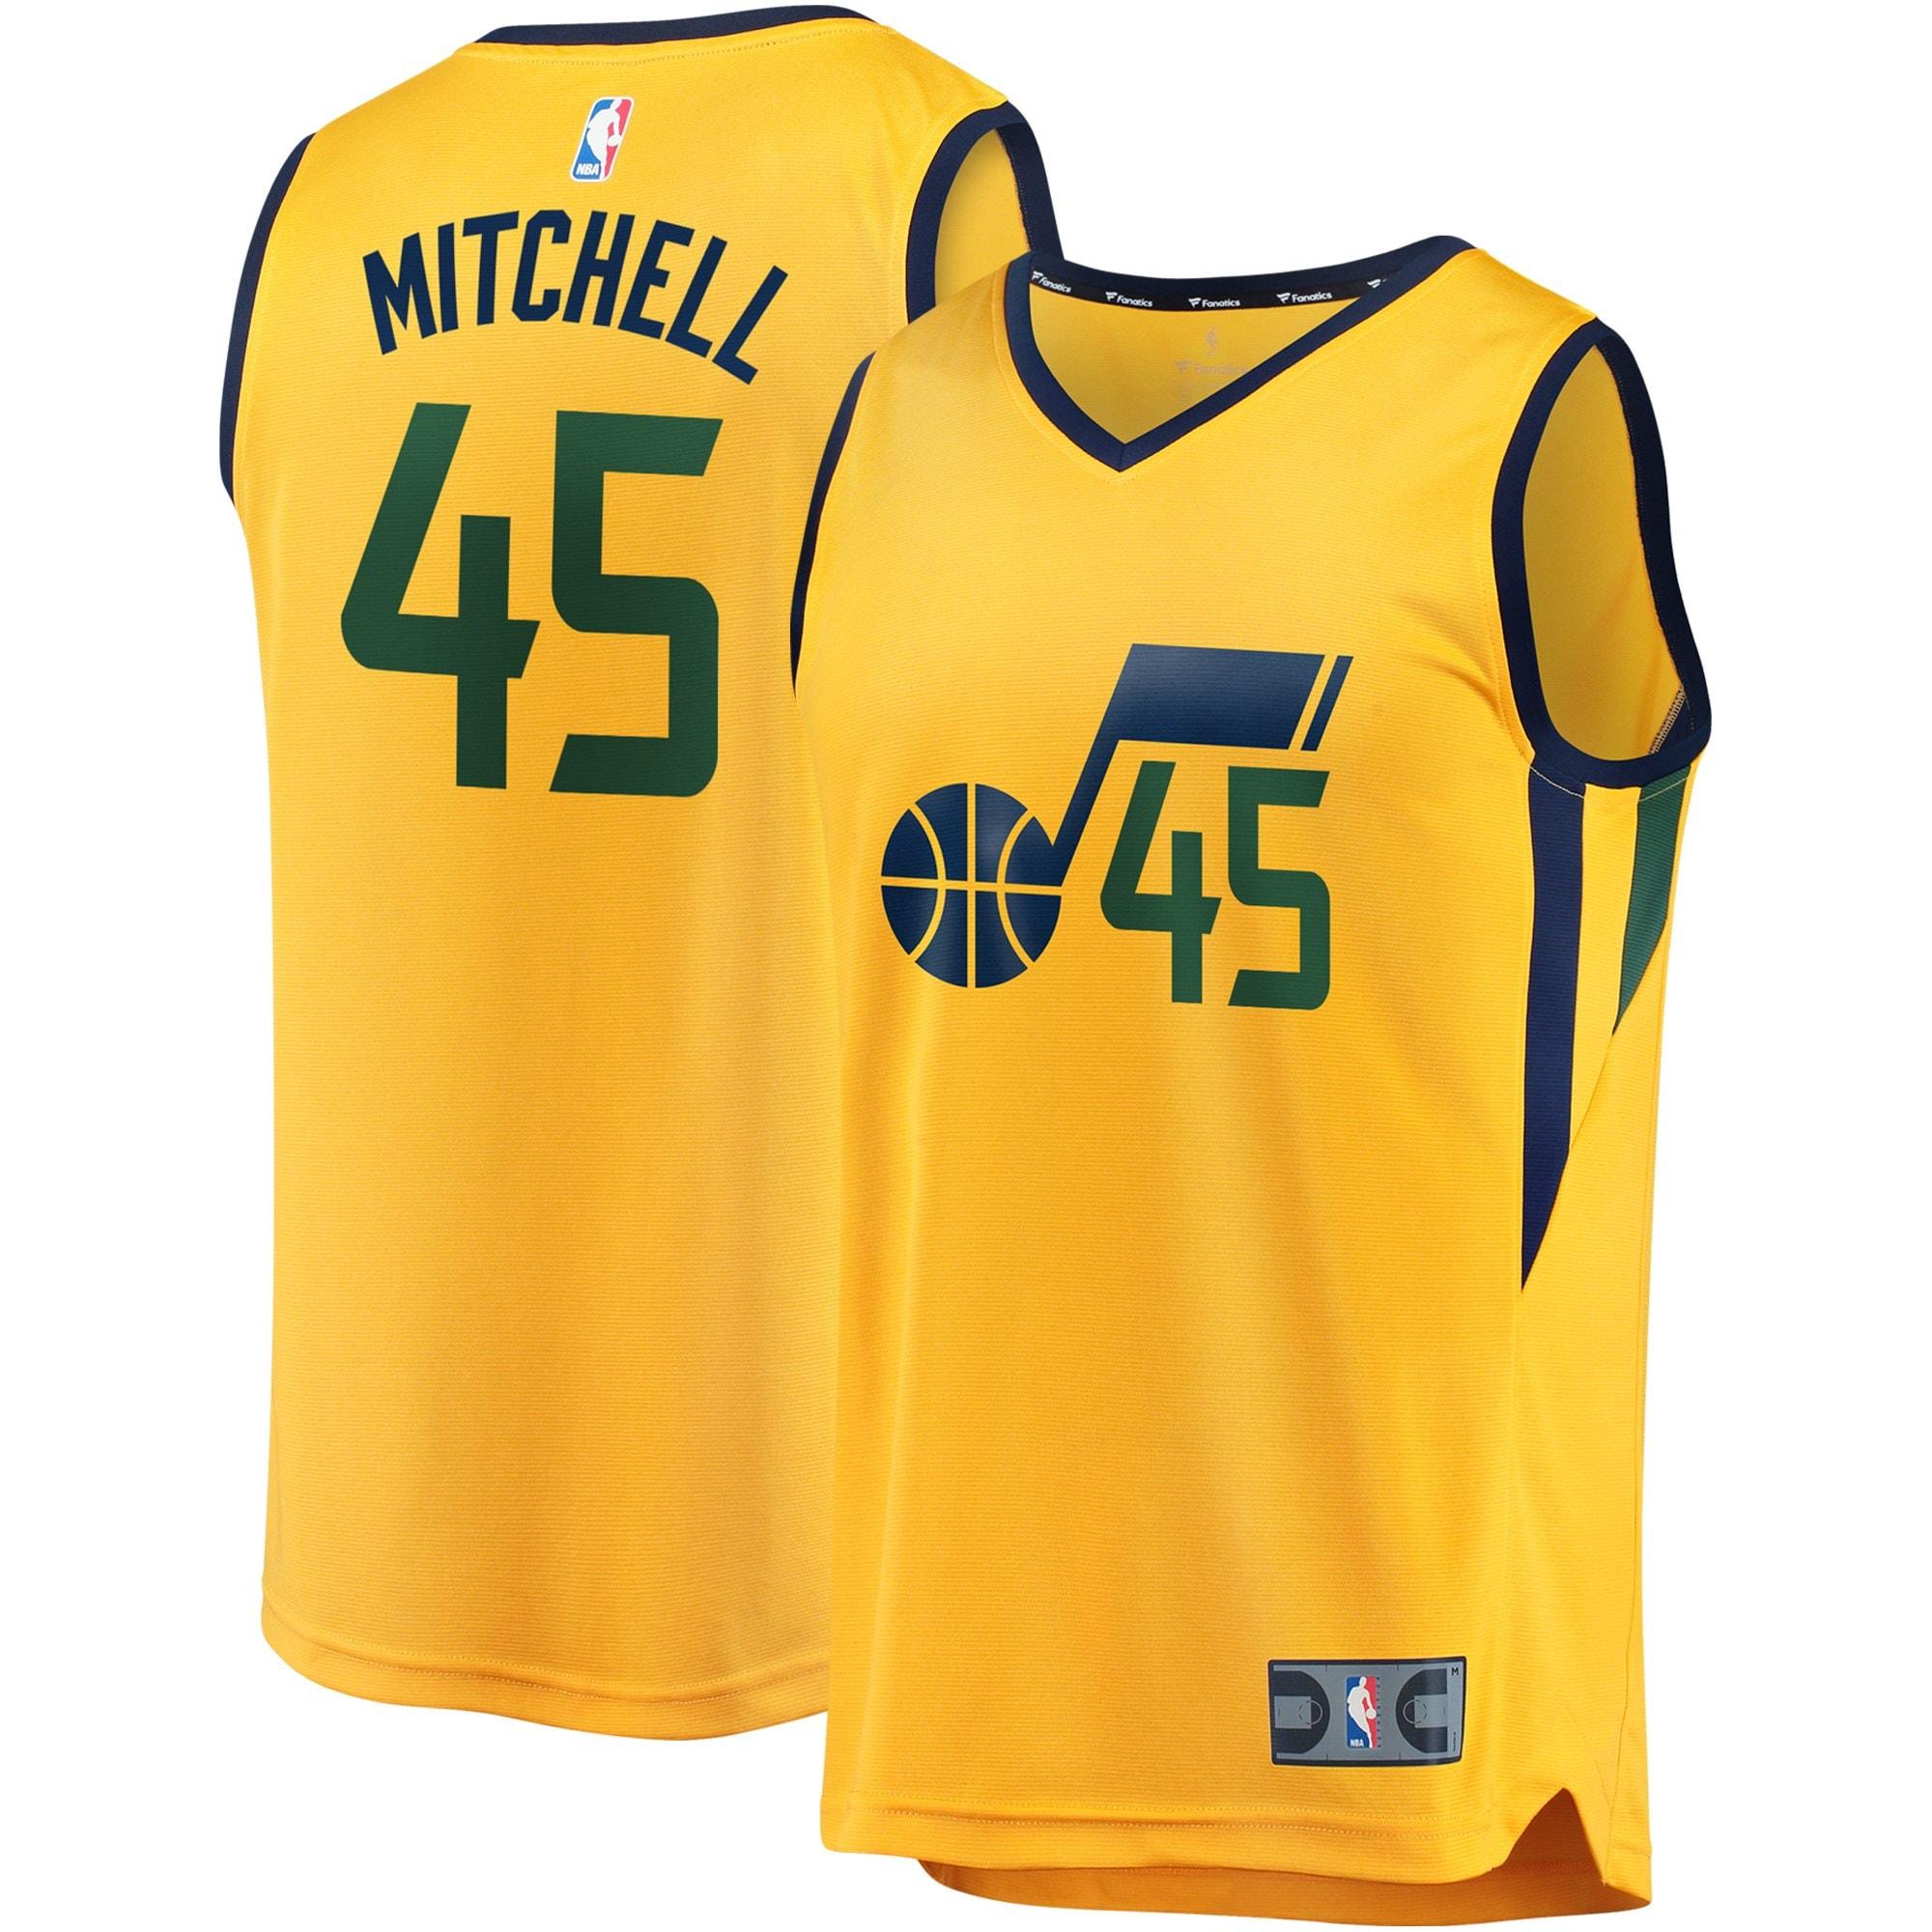 Donovan Mitchell Utah Jazz Fanatics Branded Youth Fast Break Jersey - Statement Edition - Gold